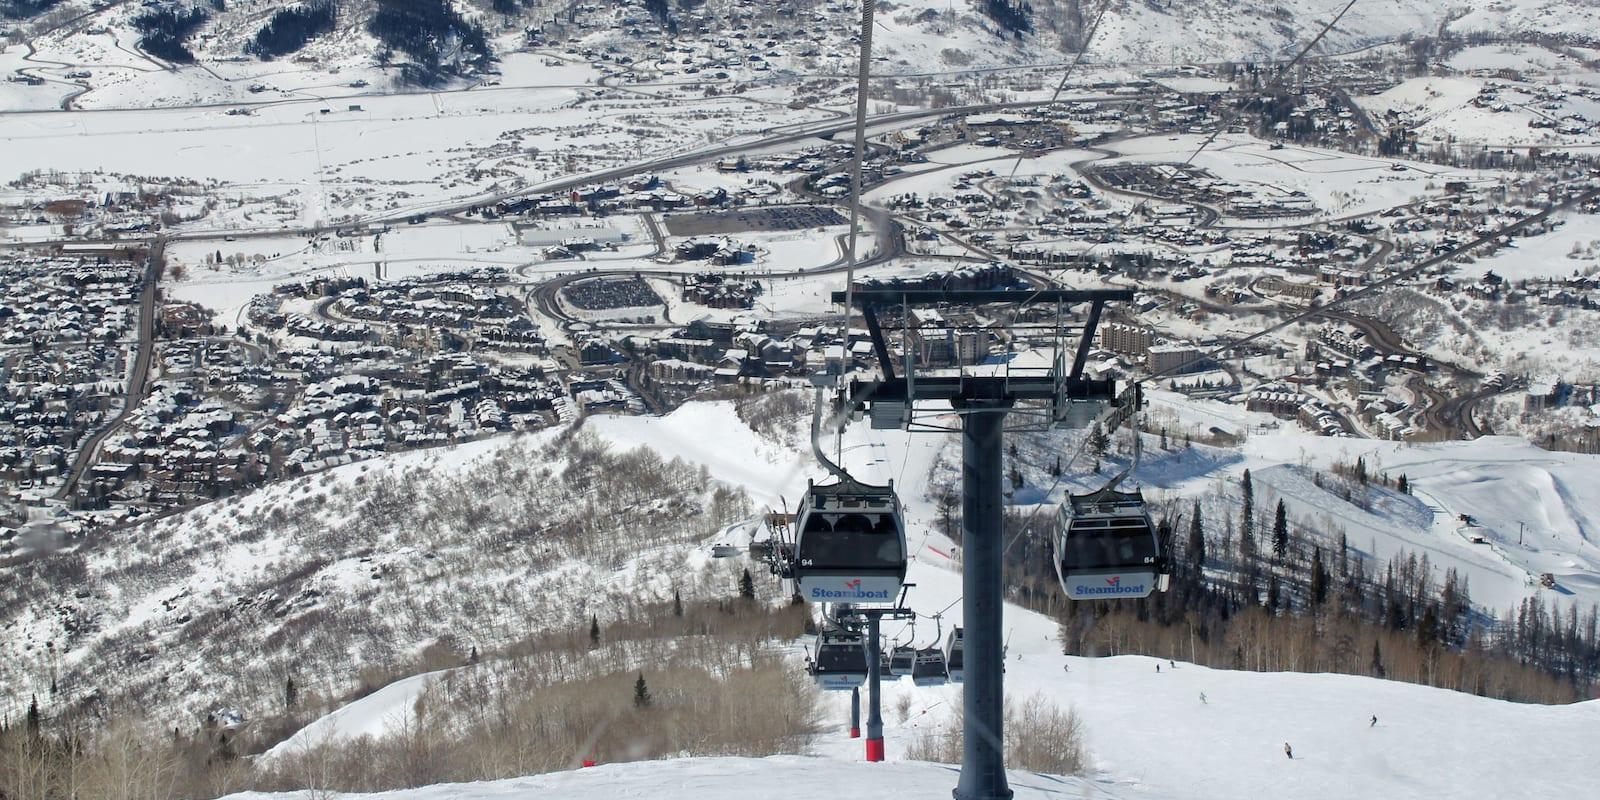 Steamboat Ski Resort Winter Gondola